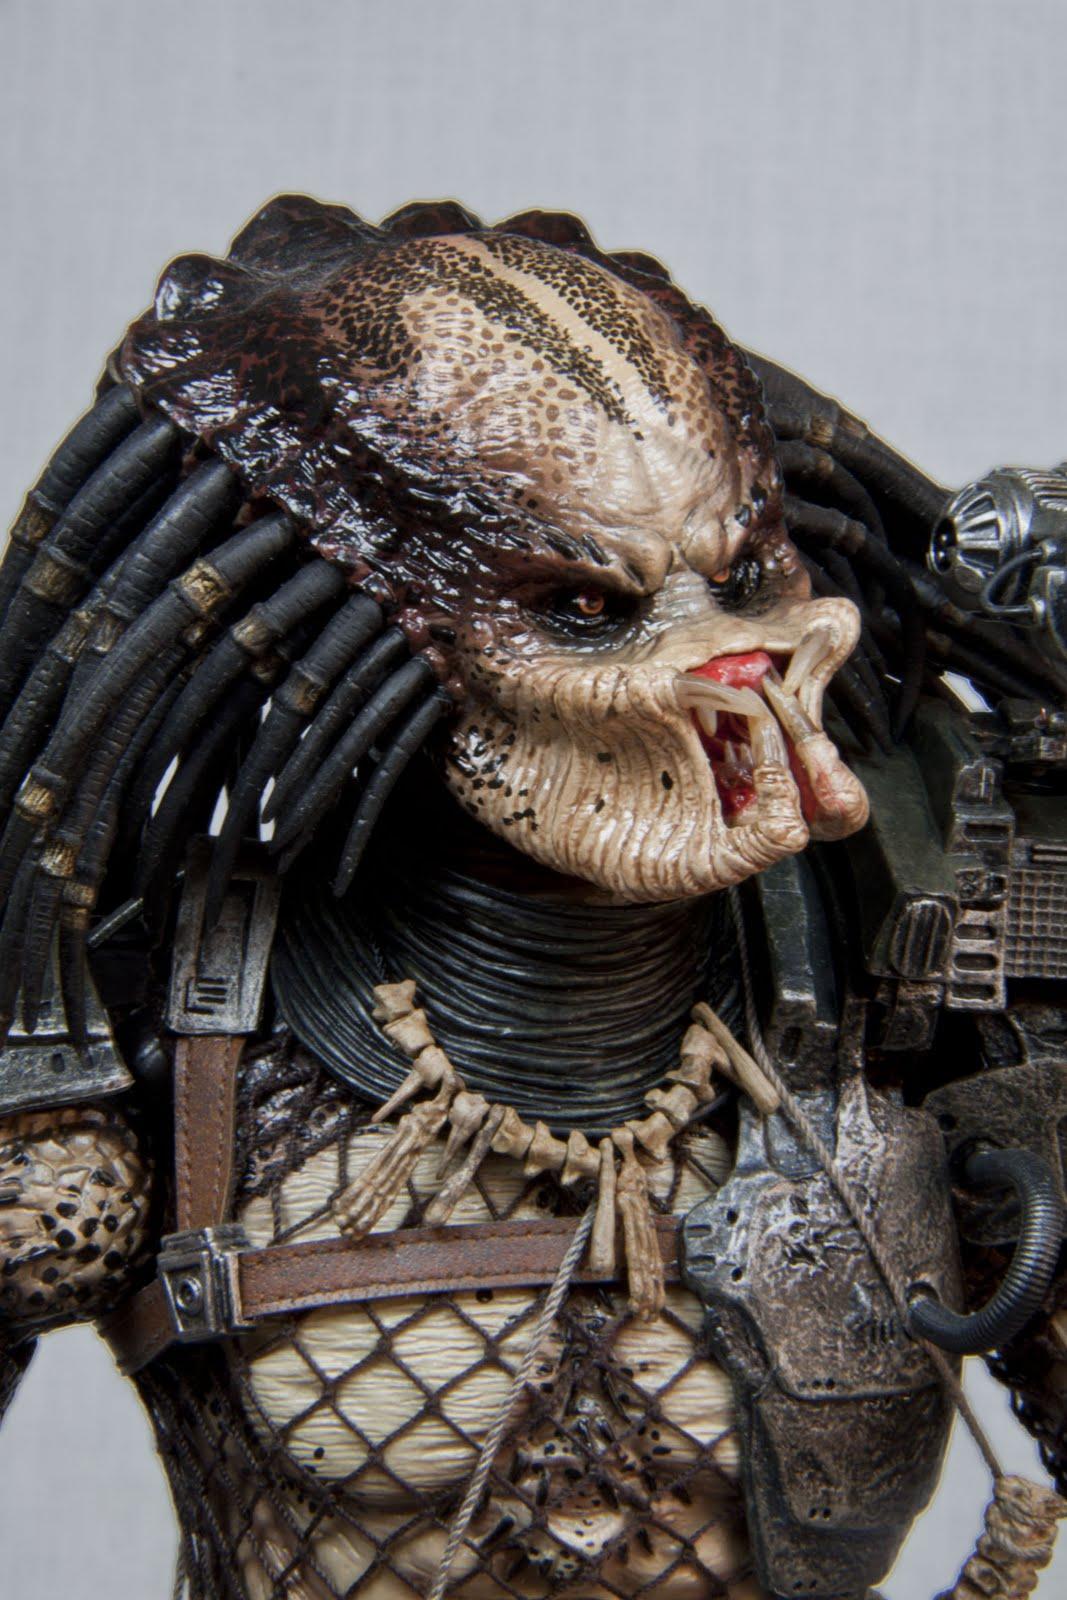 Doons Dungeon: Hot Toys Predator (Predator 1)